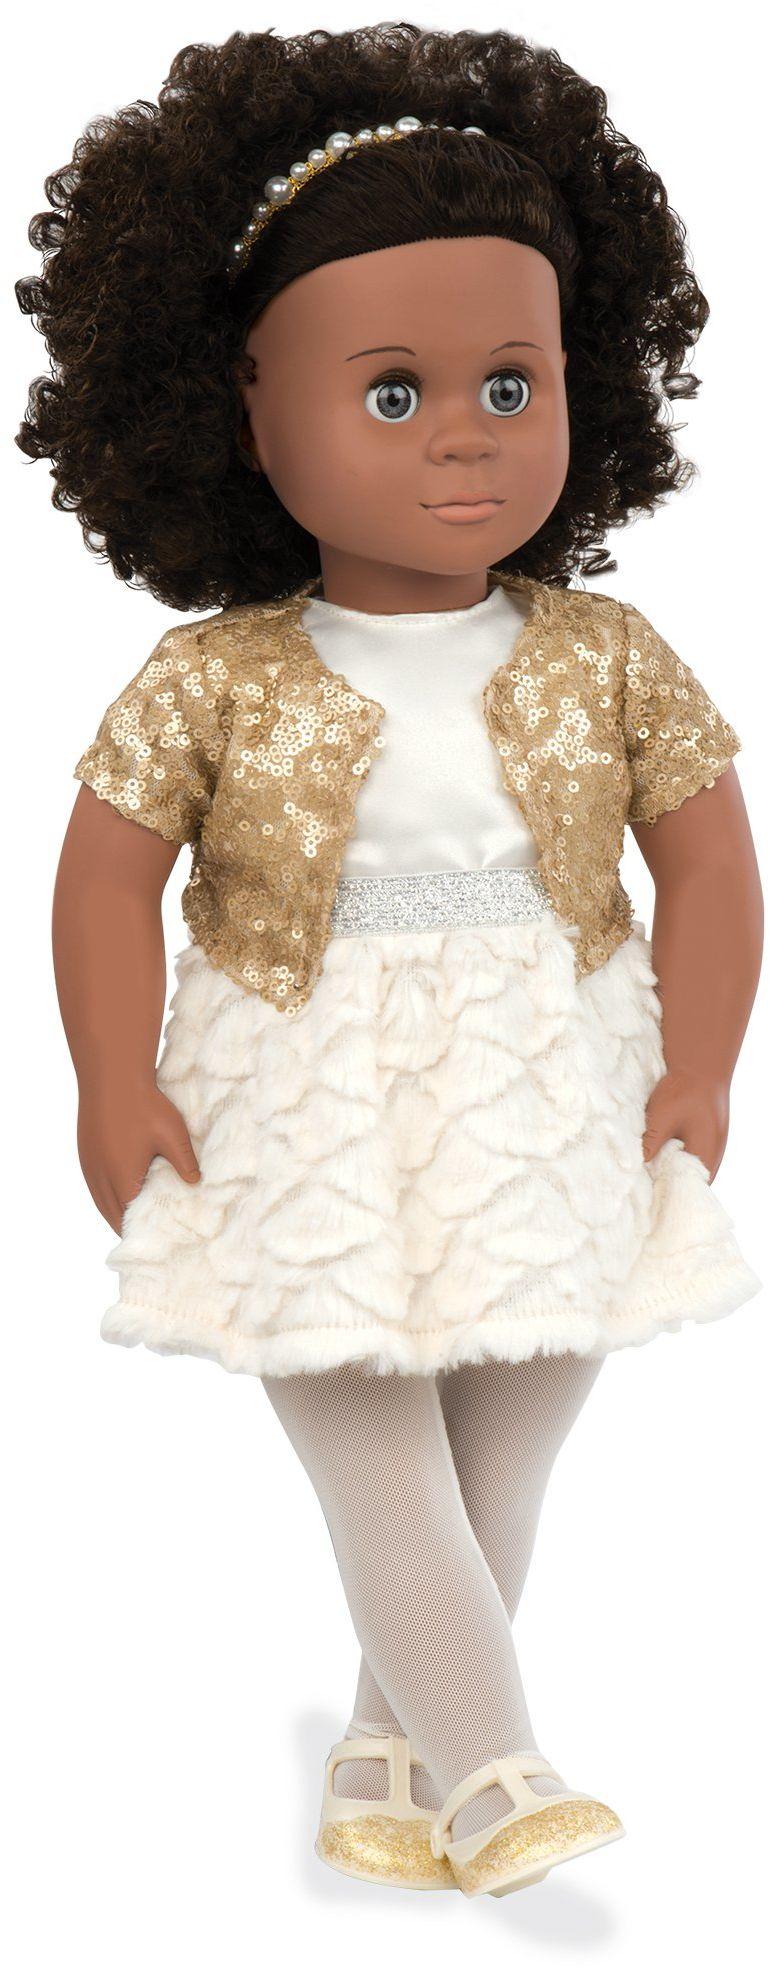 Our Generation 70.31089 Haven Doll, różna, 46 cm